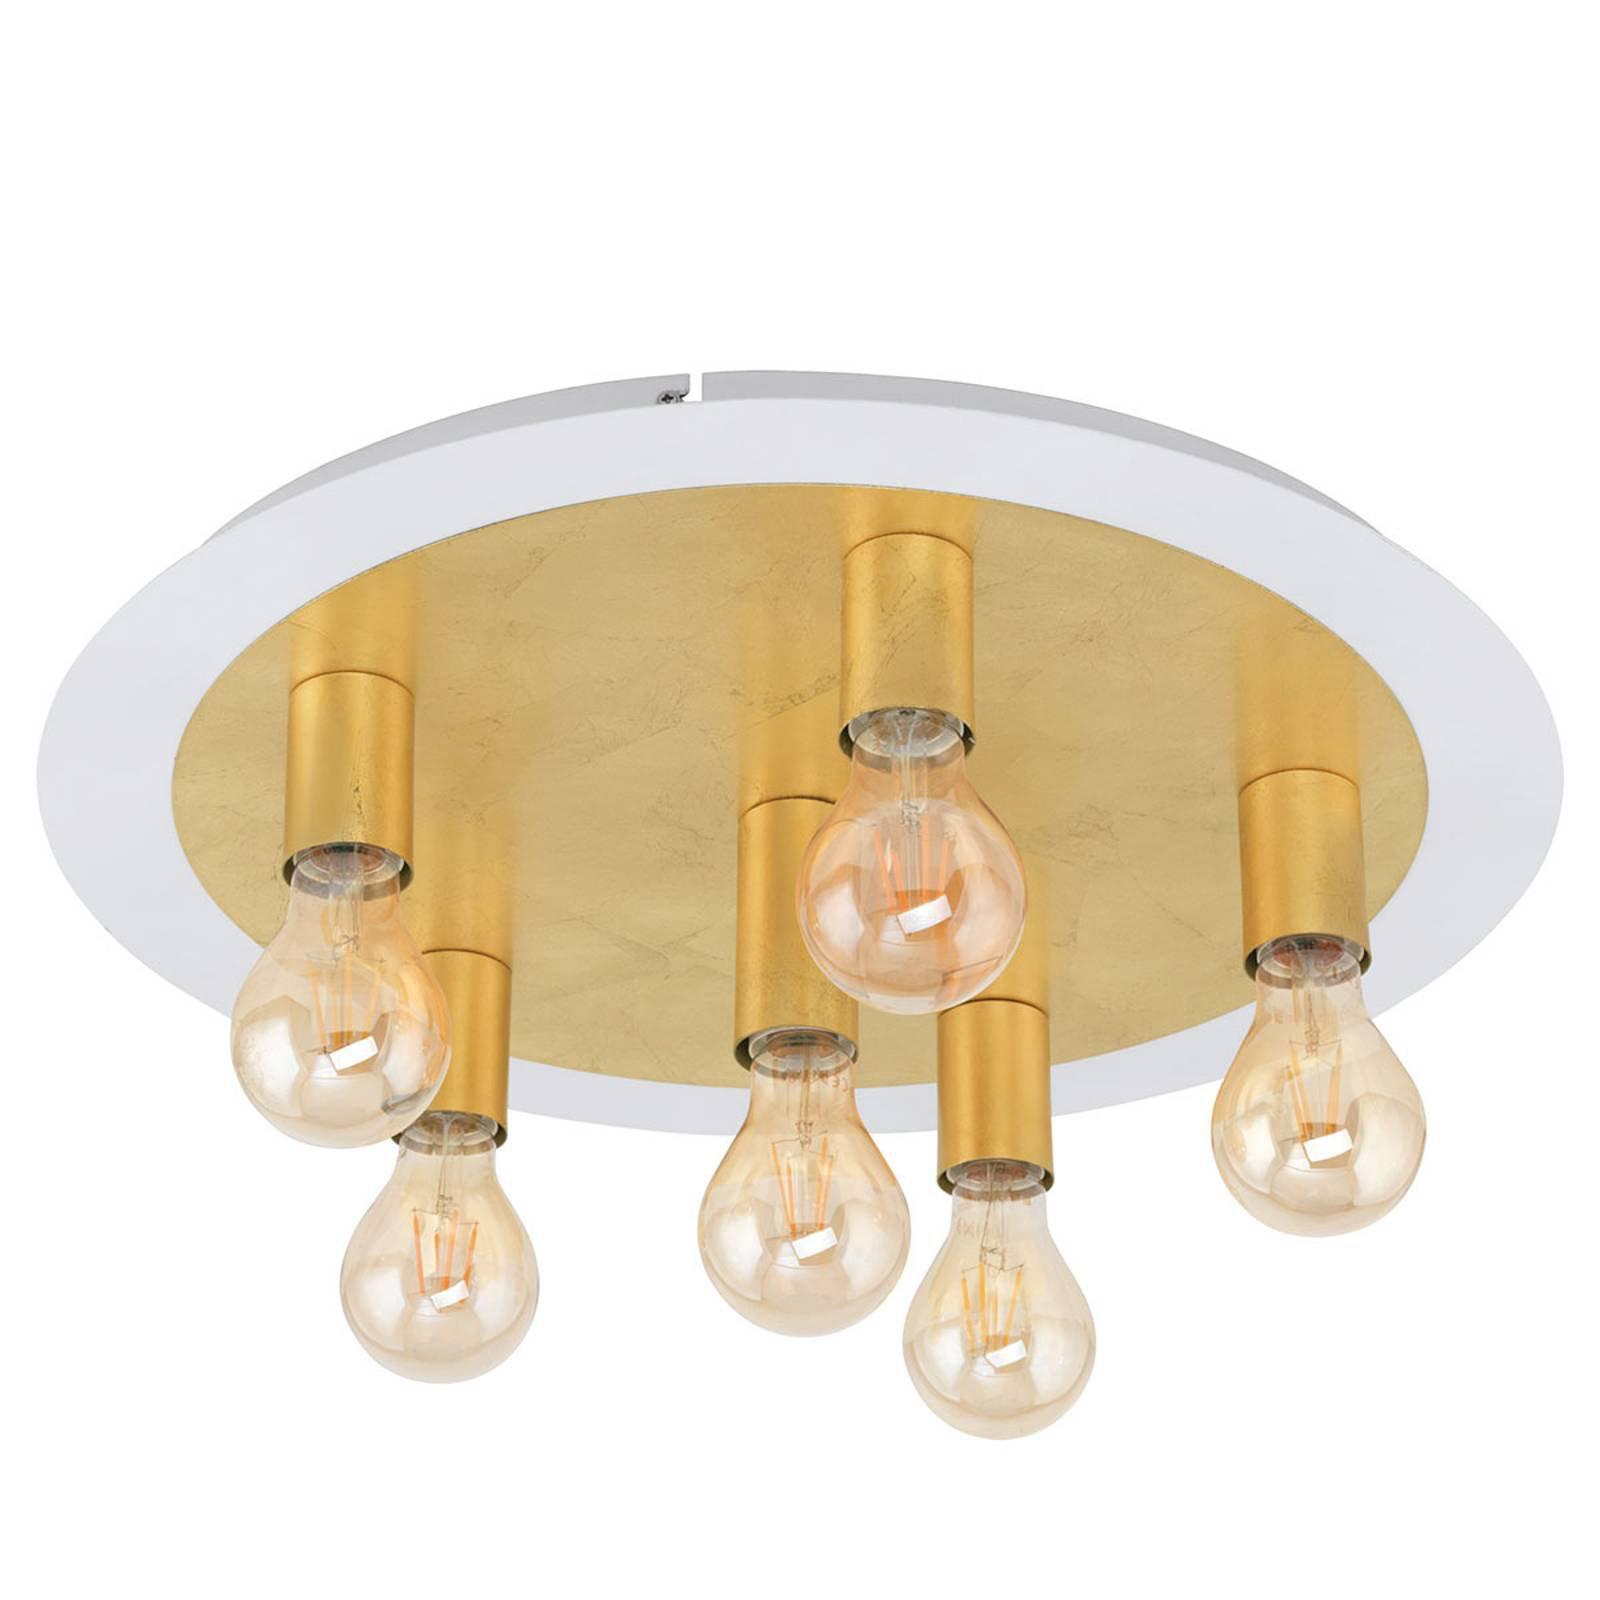 LED-taklampe Passano 6 lyskilder gull